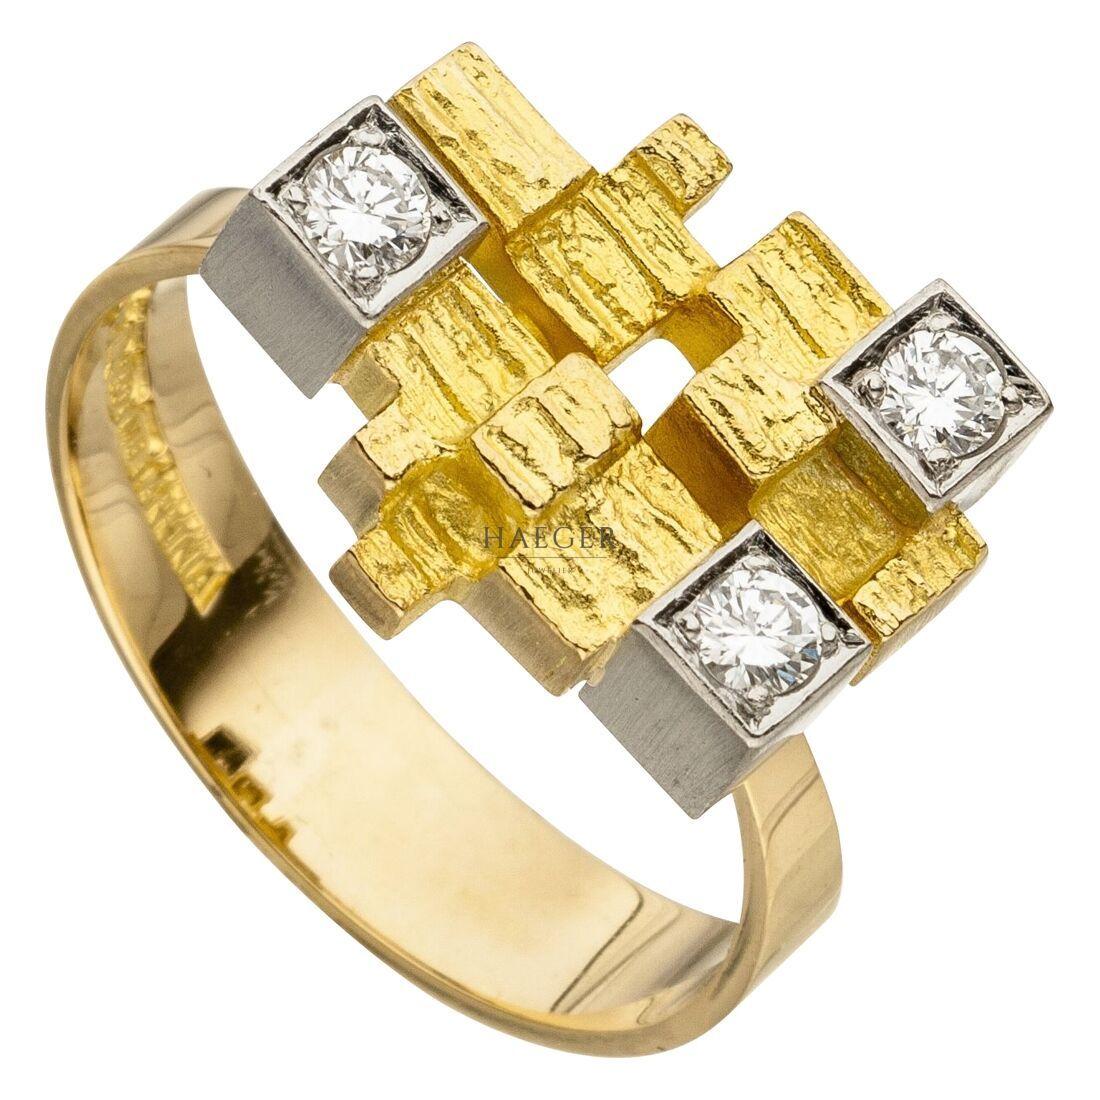 Juwelier Haeger Gmbh